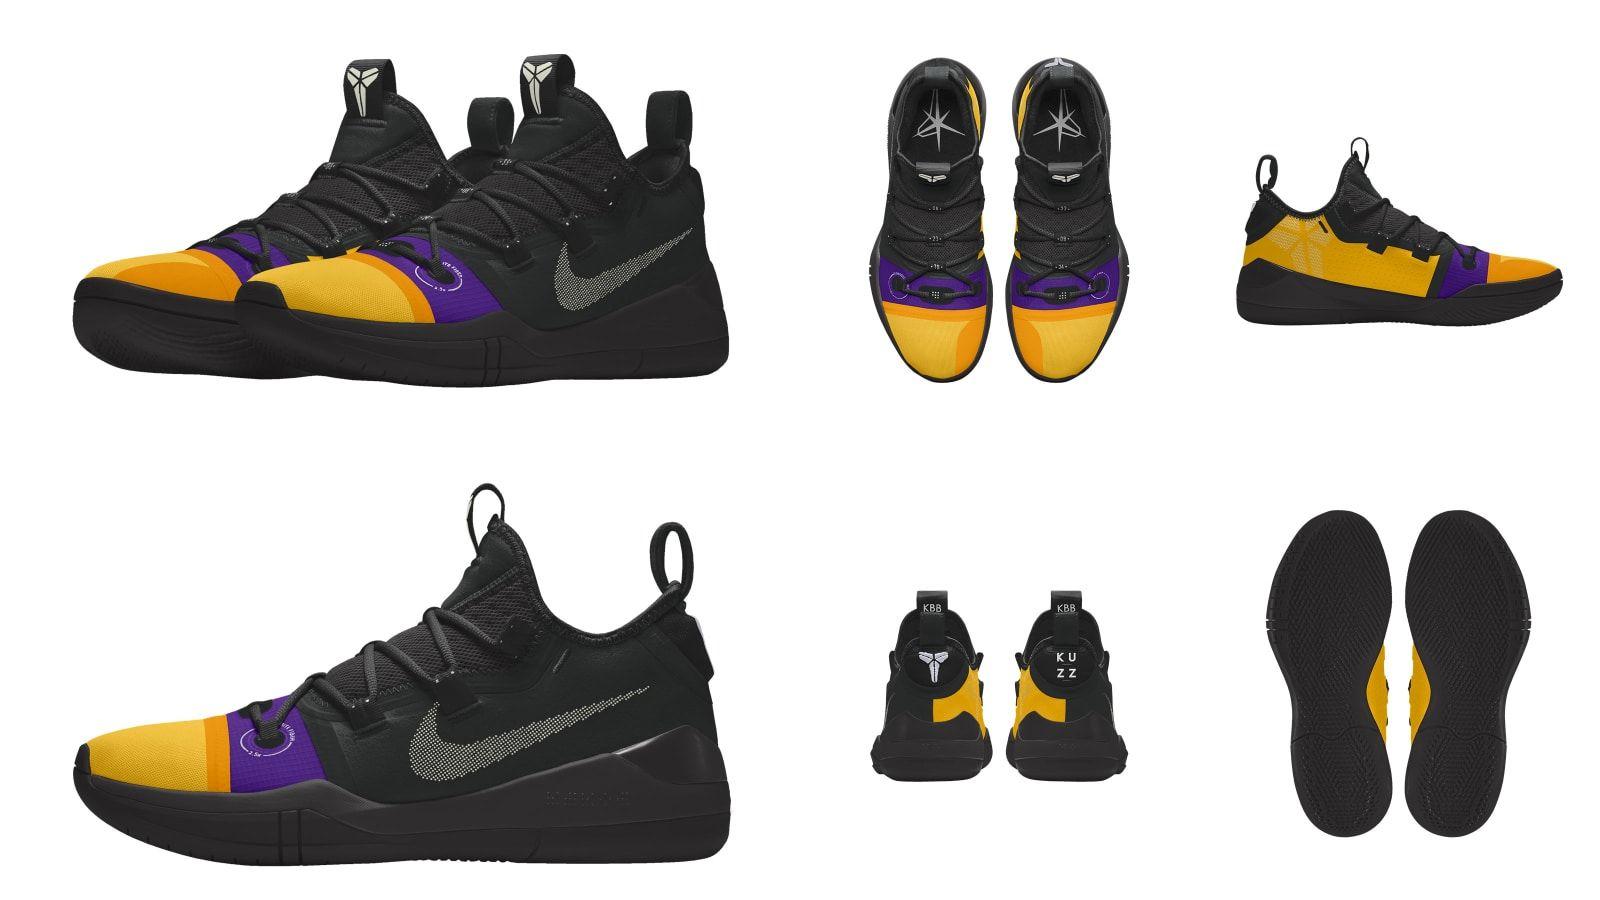 49c2f47f955b Nike Kobe A.D.  Kuzz Control  - Nike Let Players Design Sneakers for NBA s  2018-19 Opening Week